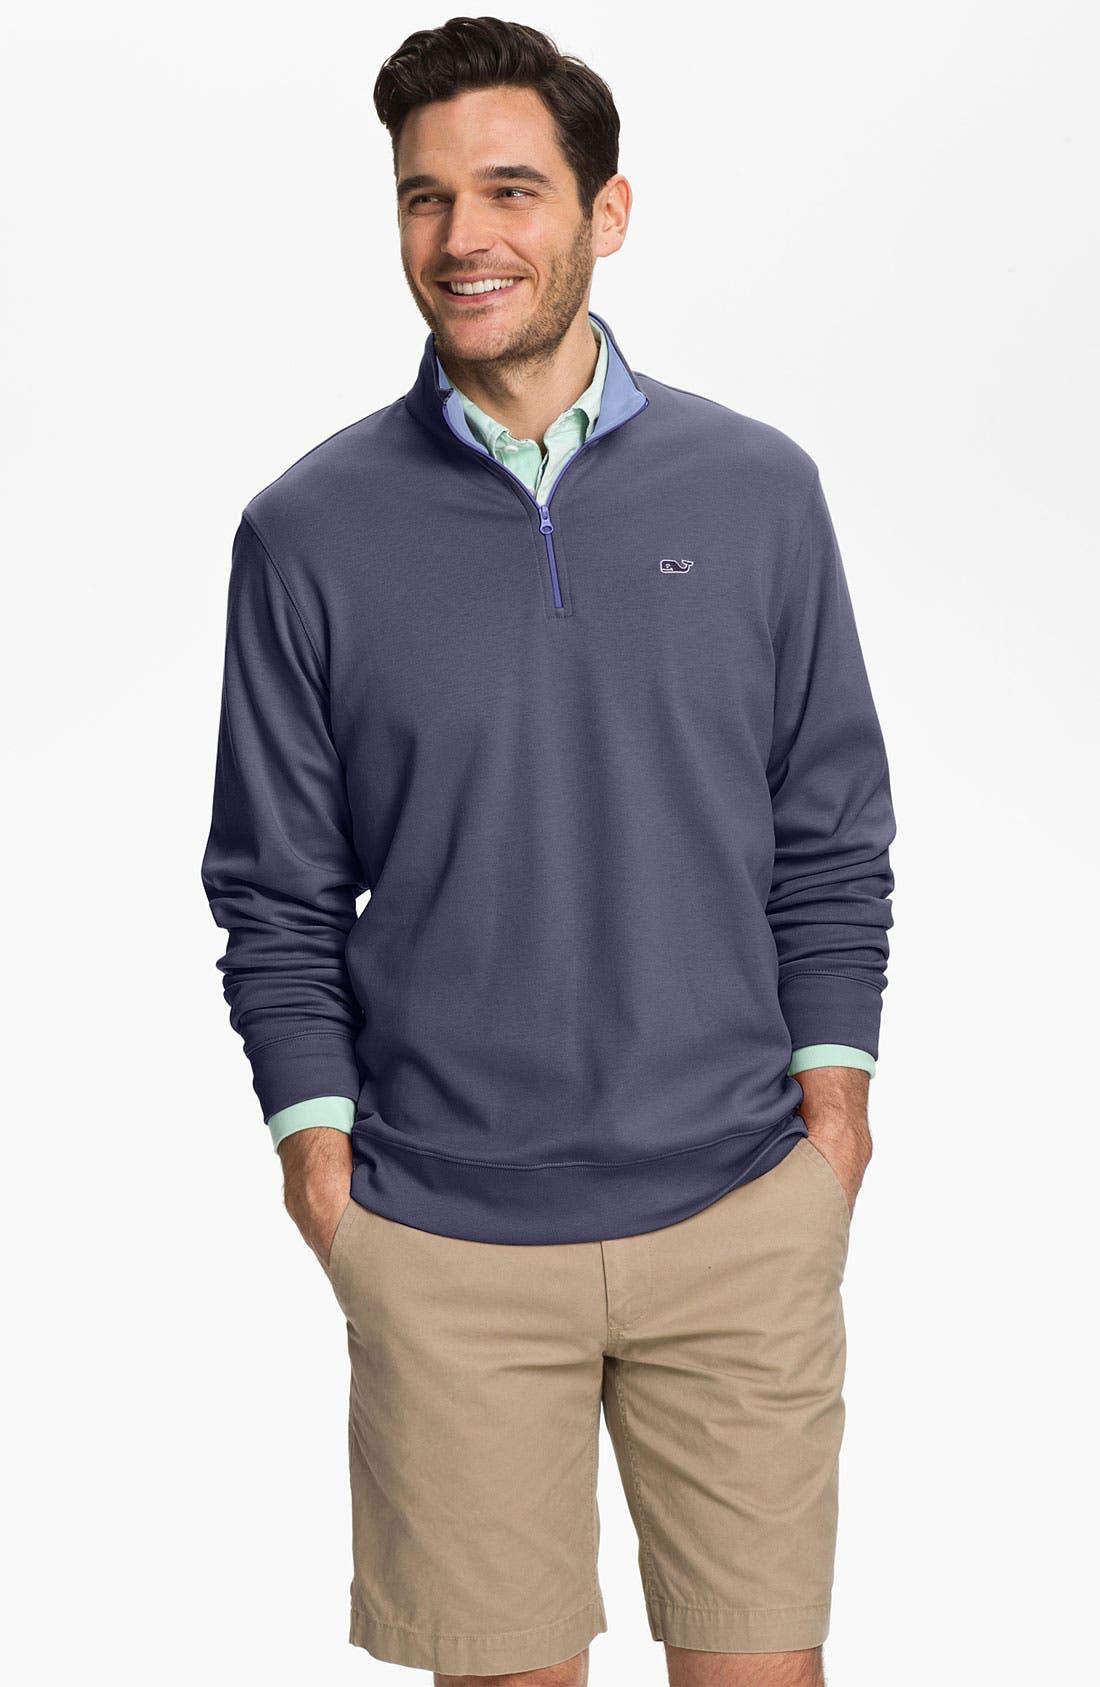 Main Image - Vineyard Vines Quarter Zip Sweatshirt